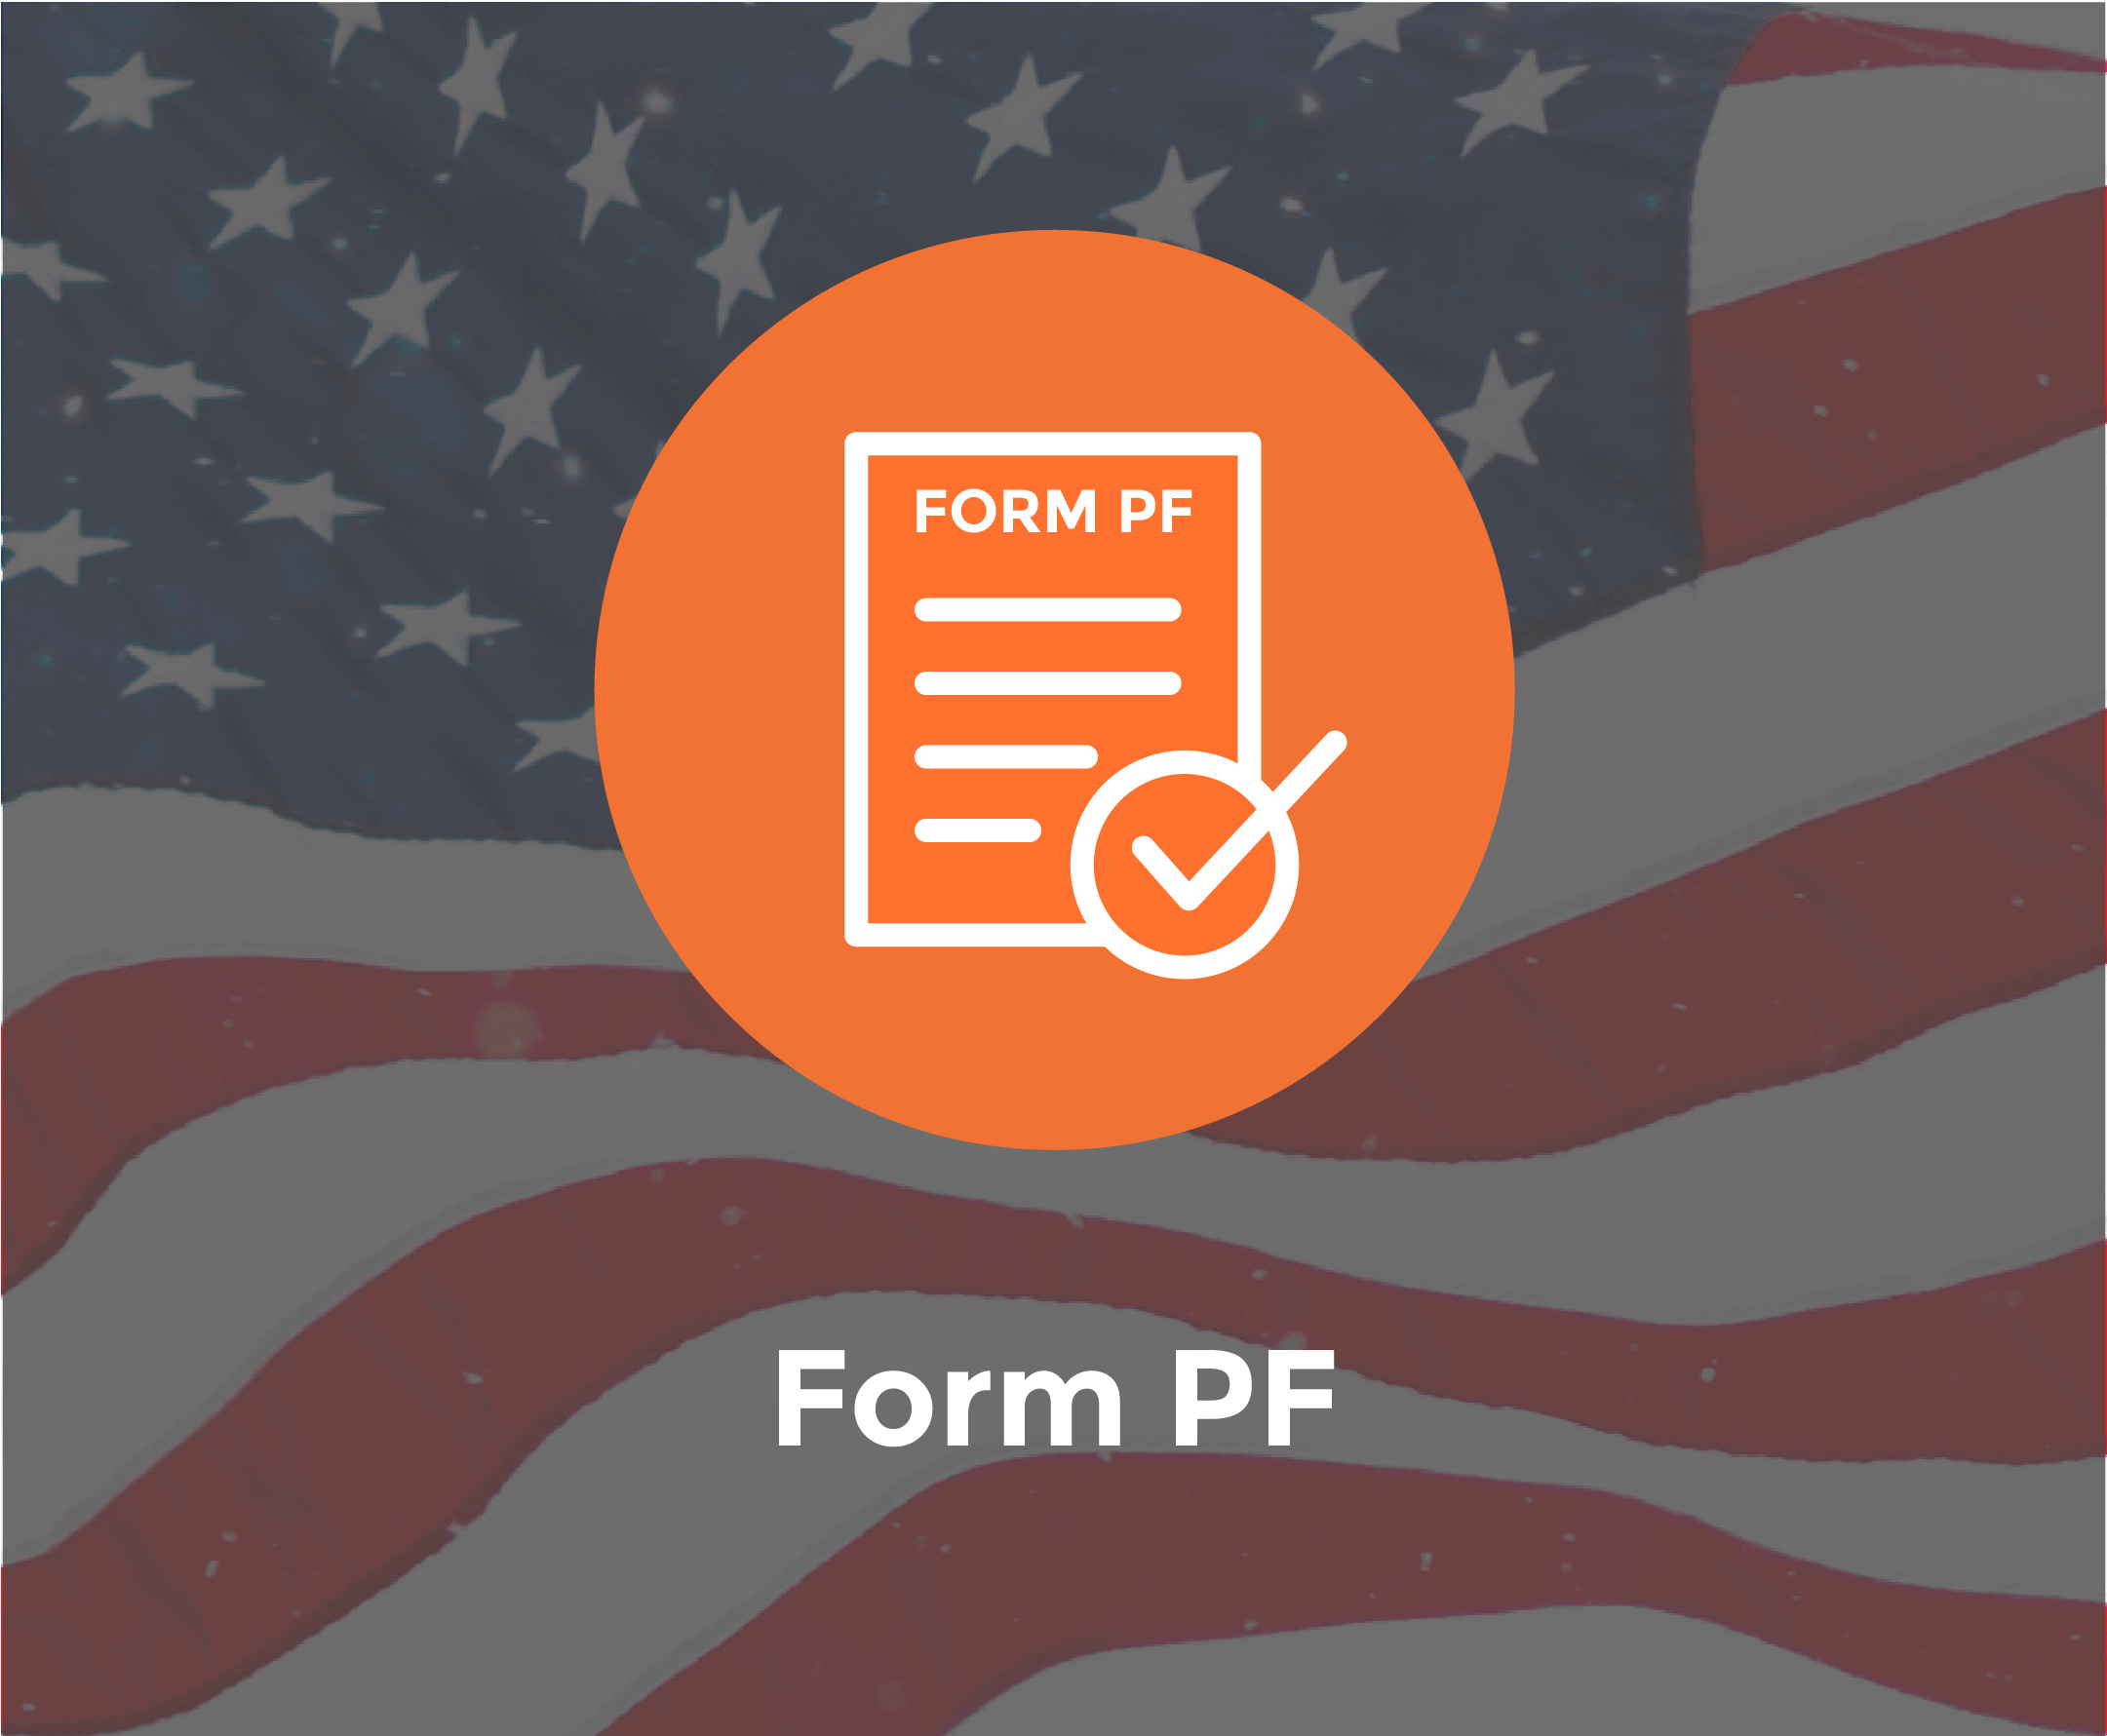 Form PF